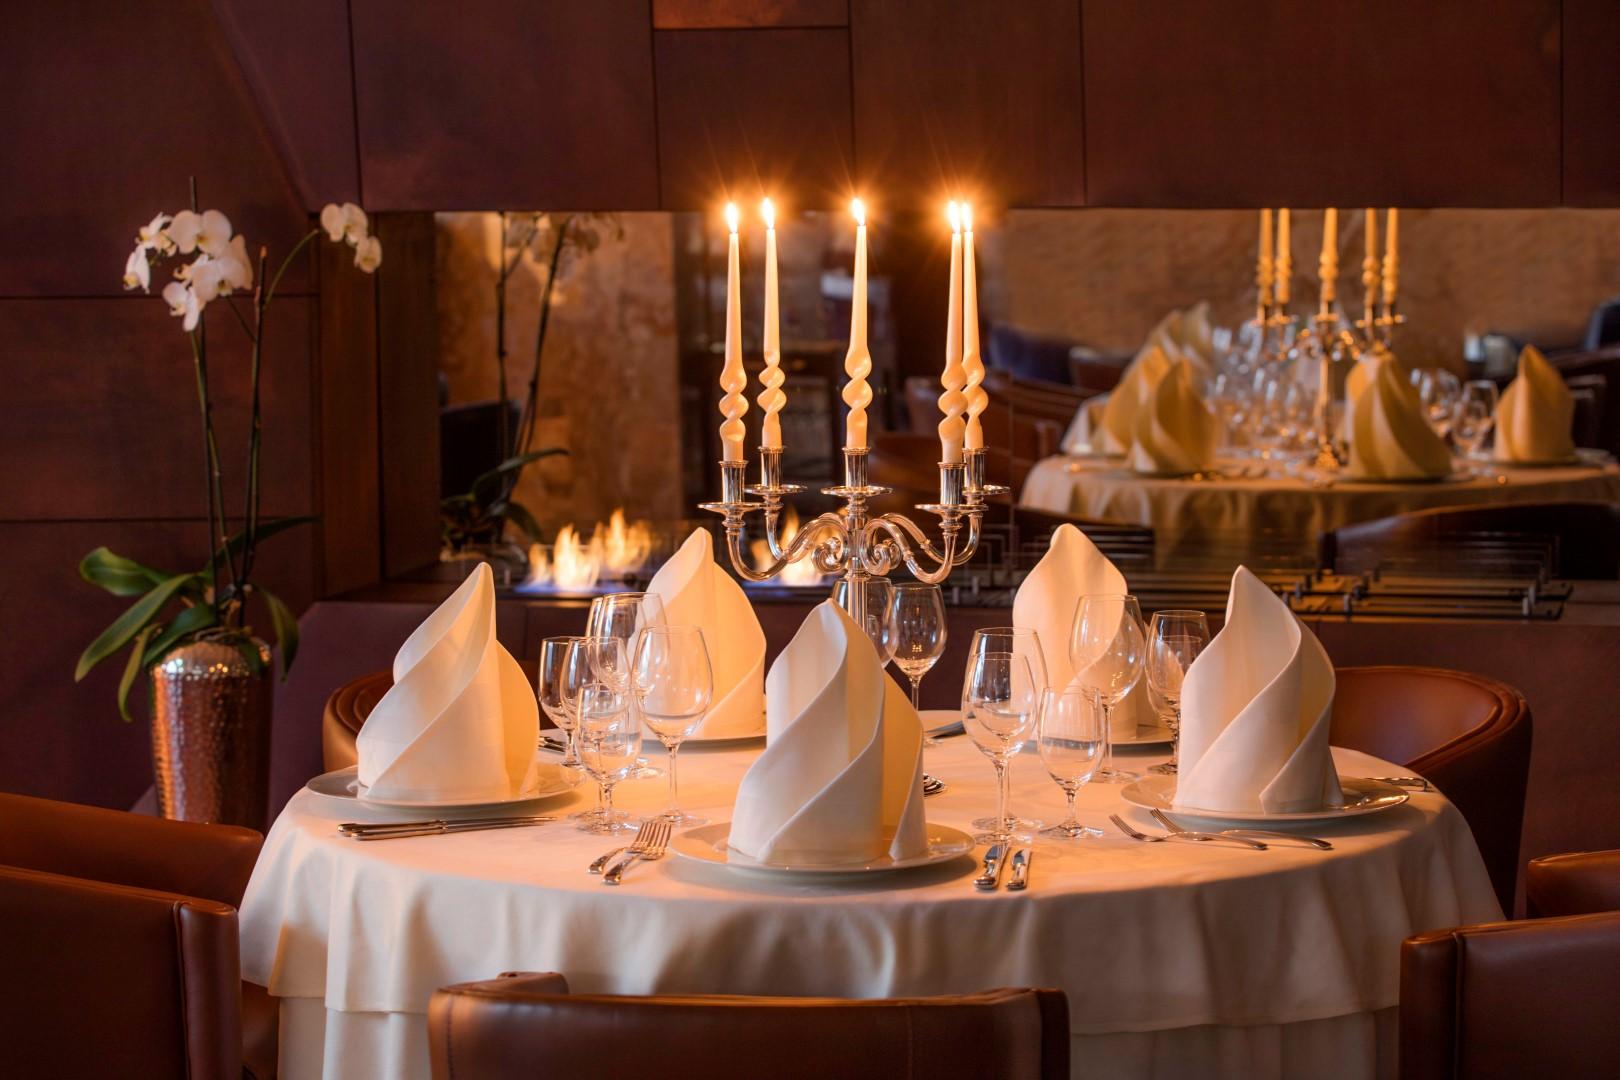 fotografija interijera hotela - stola za večeru